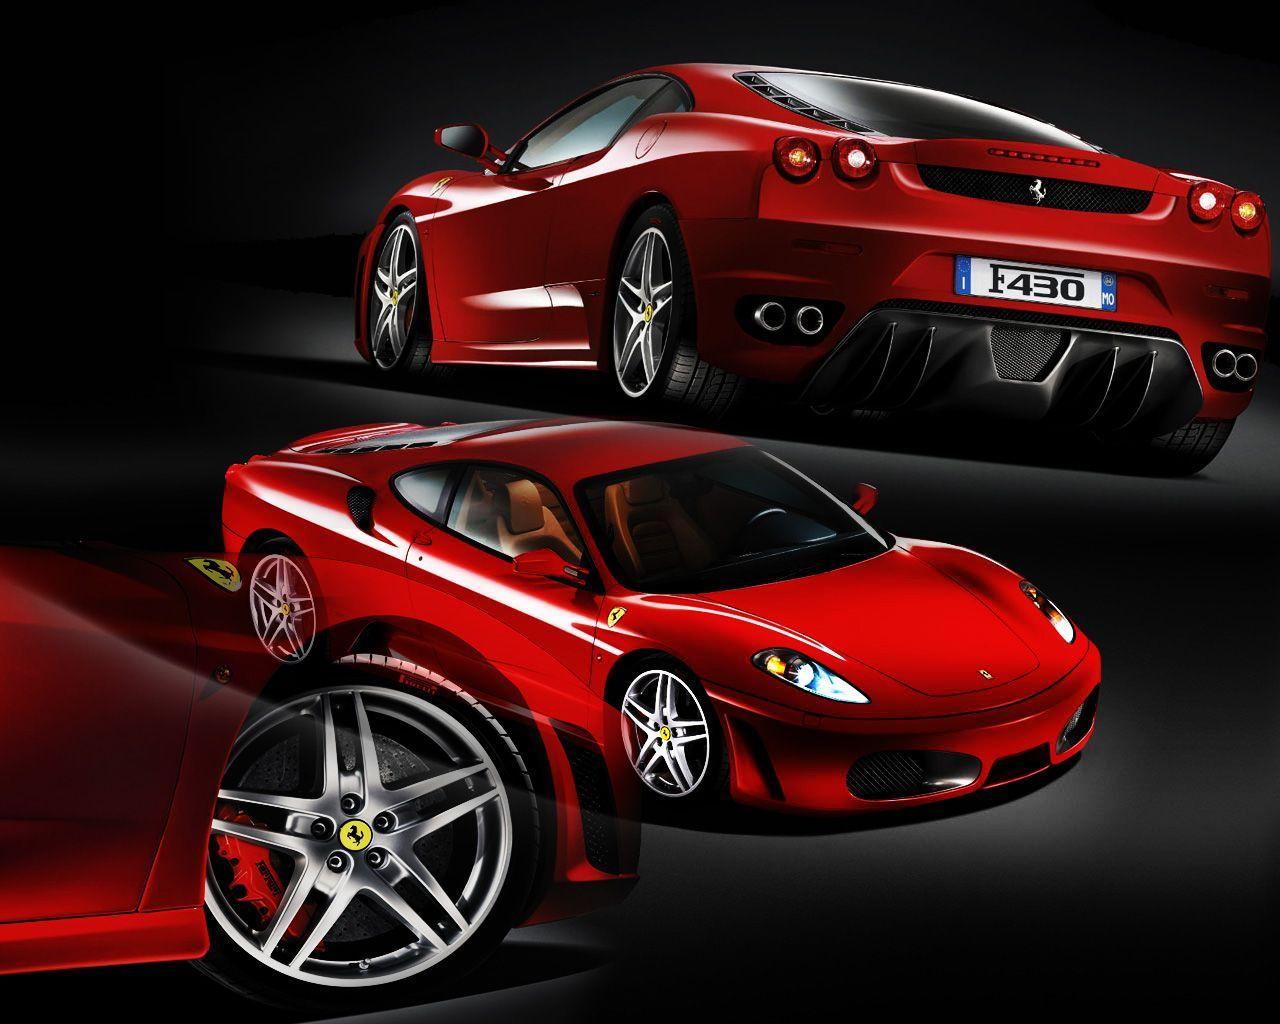 Sport Car Picture Ferrari F430 Wallpaper 2004 Ferrari F430 1280x1024 Download Hd Wallpaper Wallpapertip